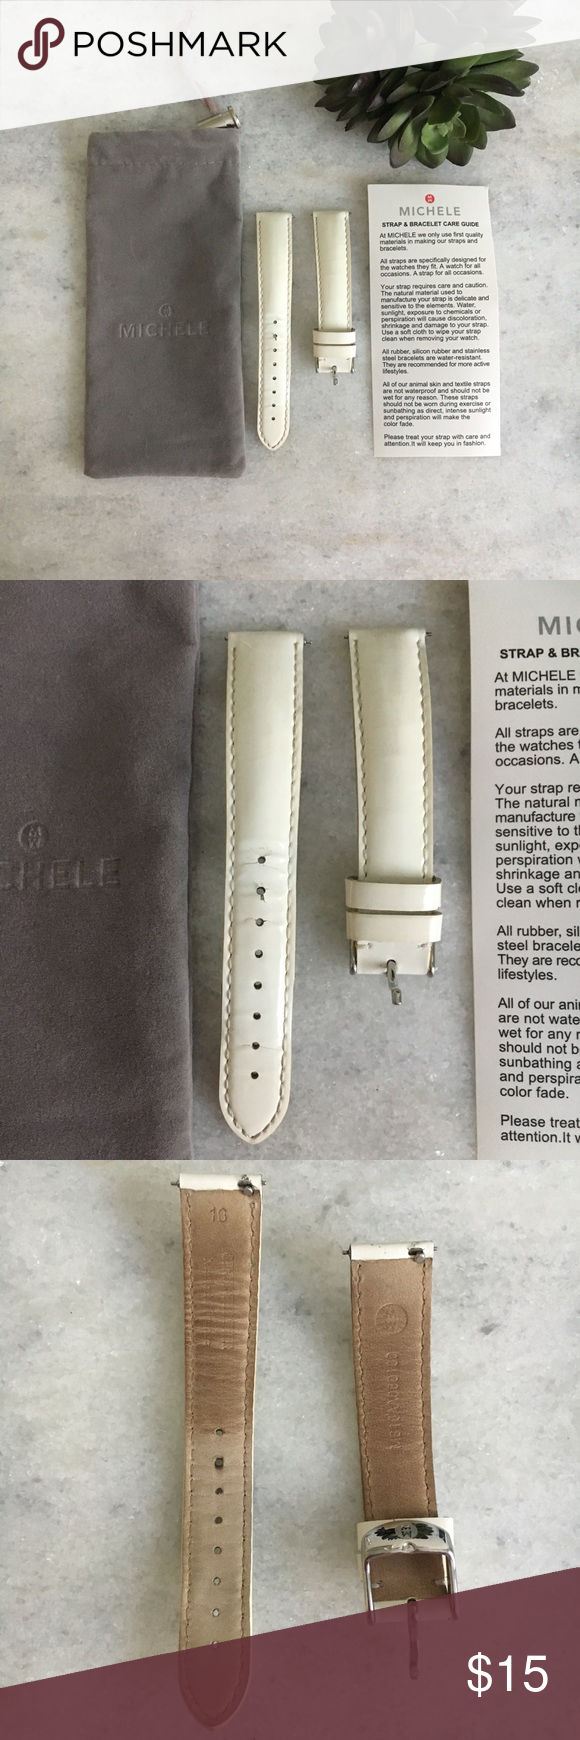 Michele White Patent Leather Watch Band Leather Watch Bands Watch Bands Leather Watch